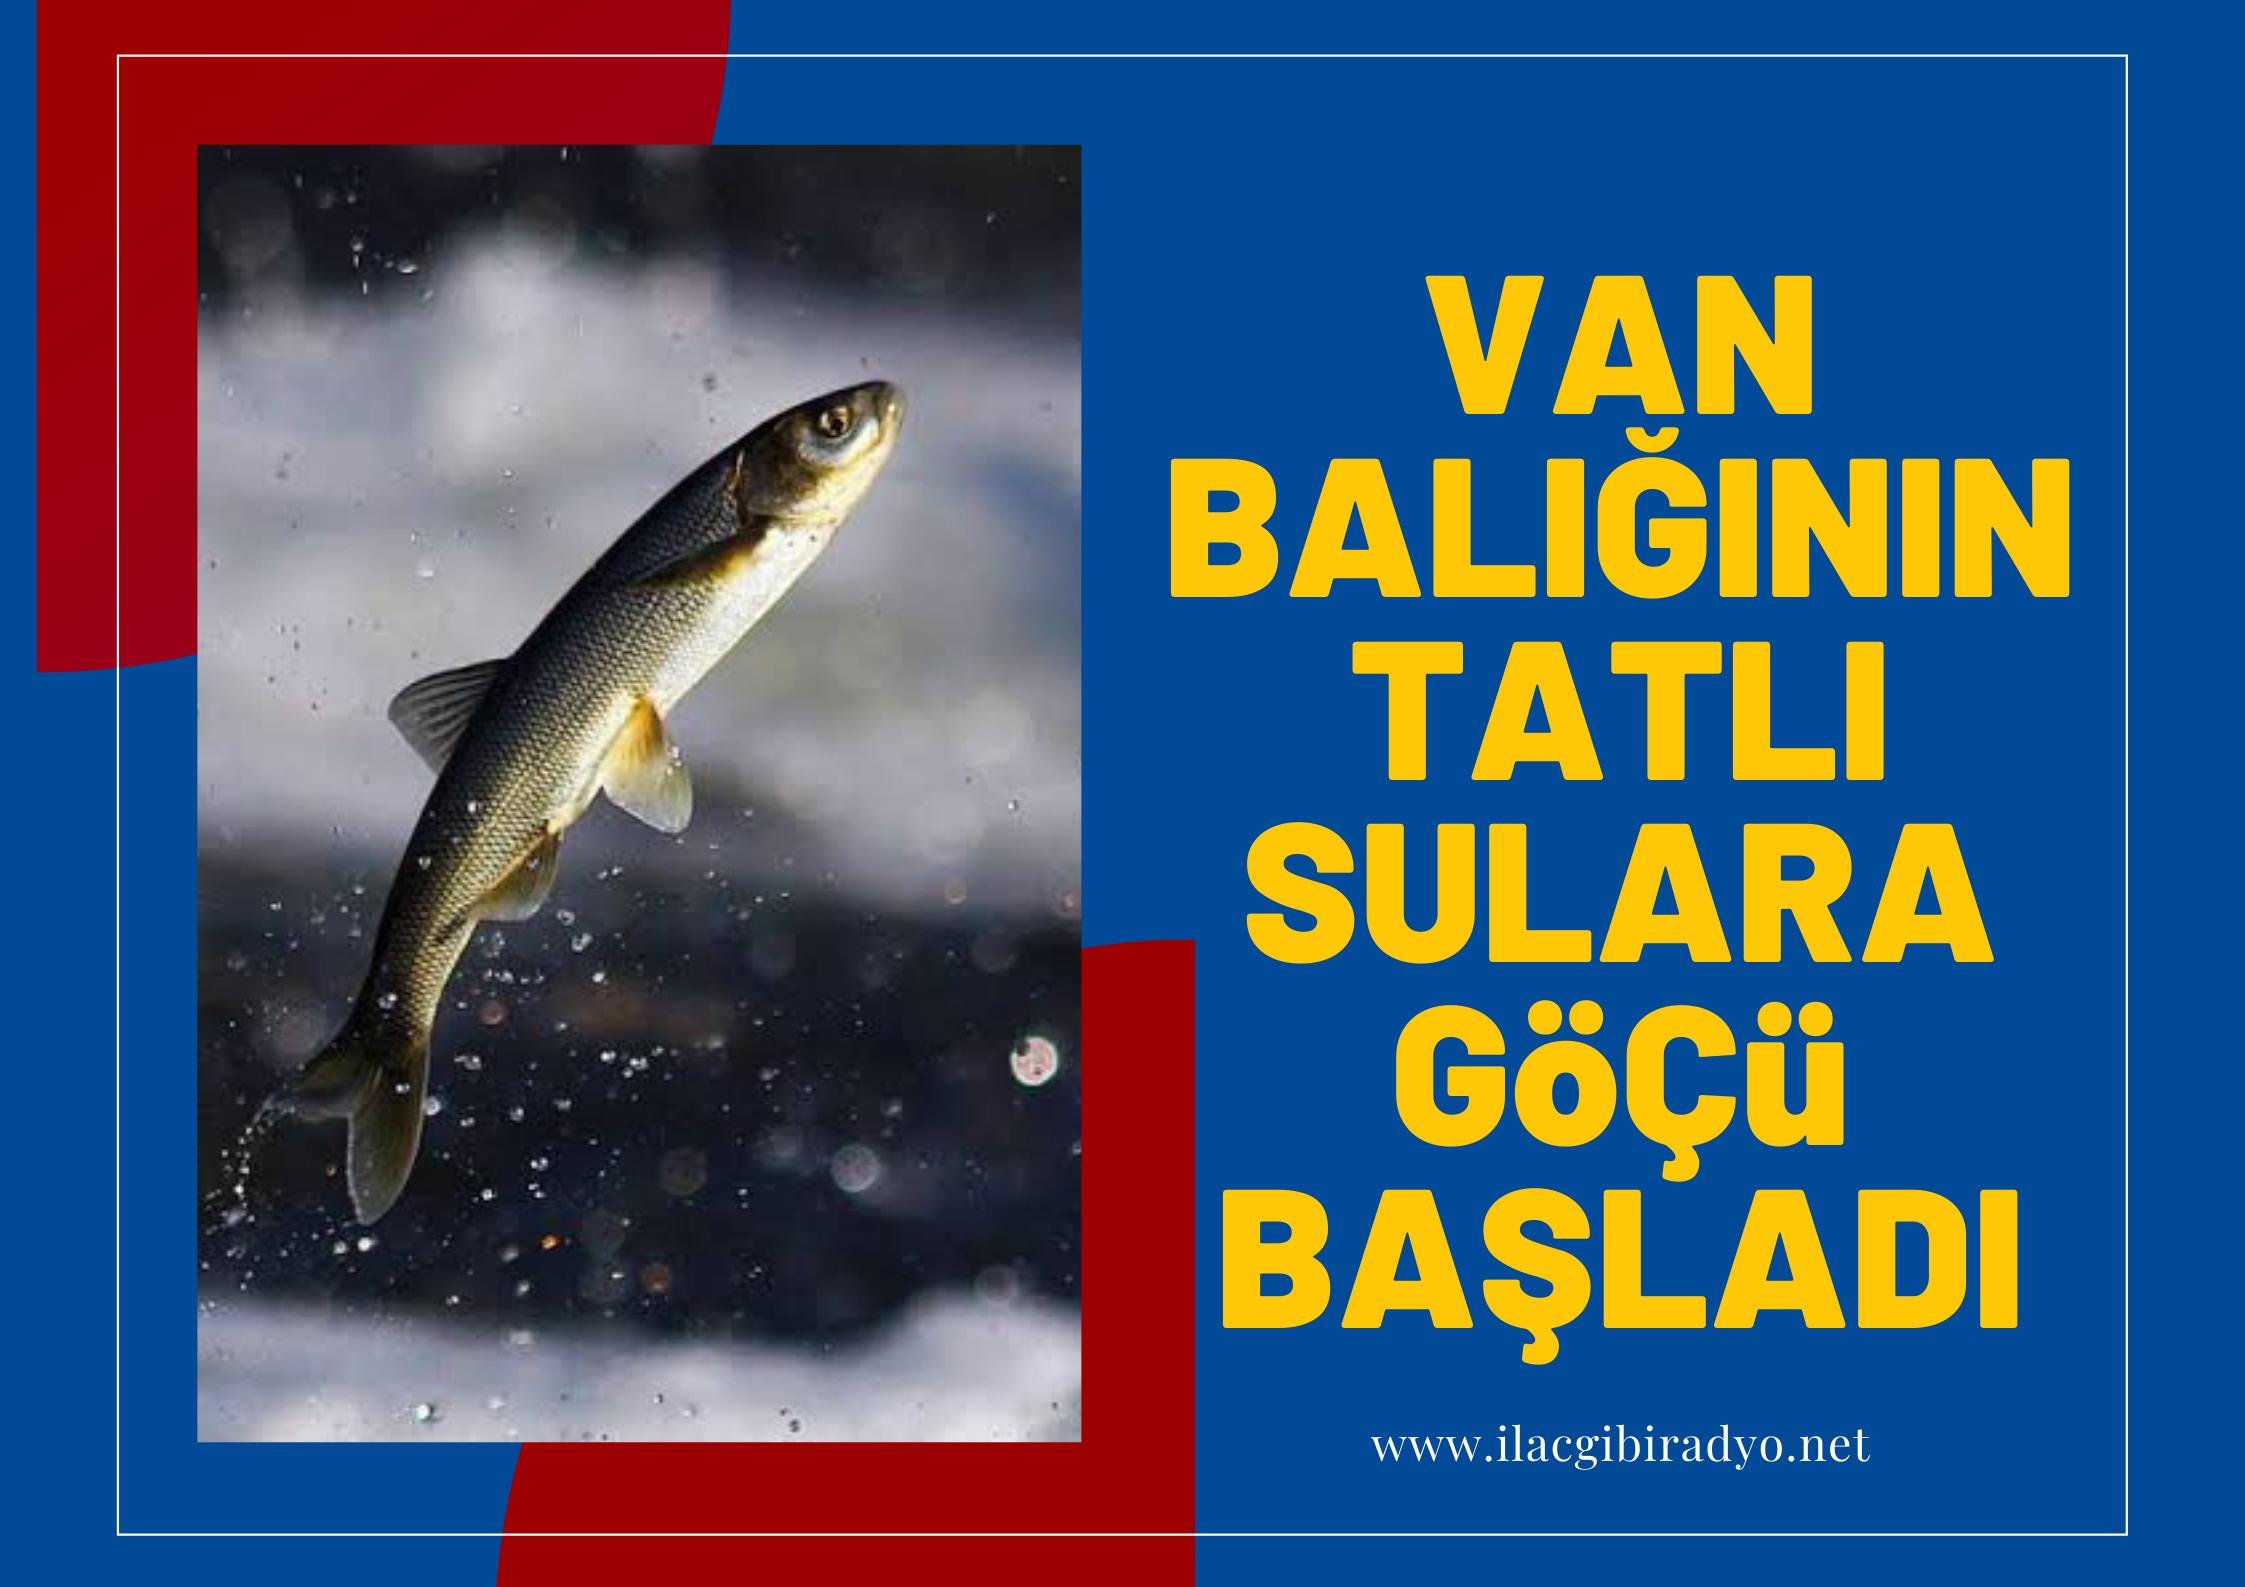 Van Balığının tatlı sulara göçü başladı